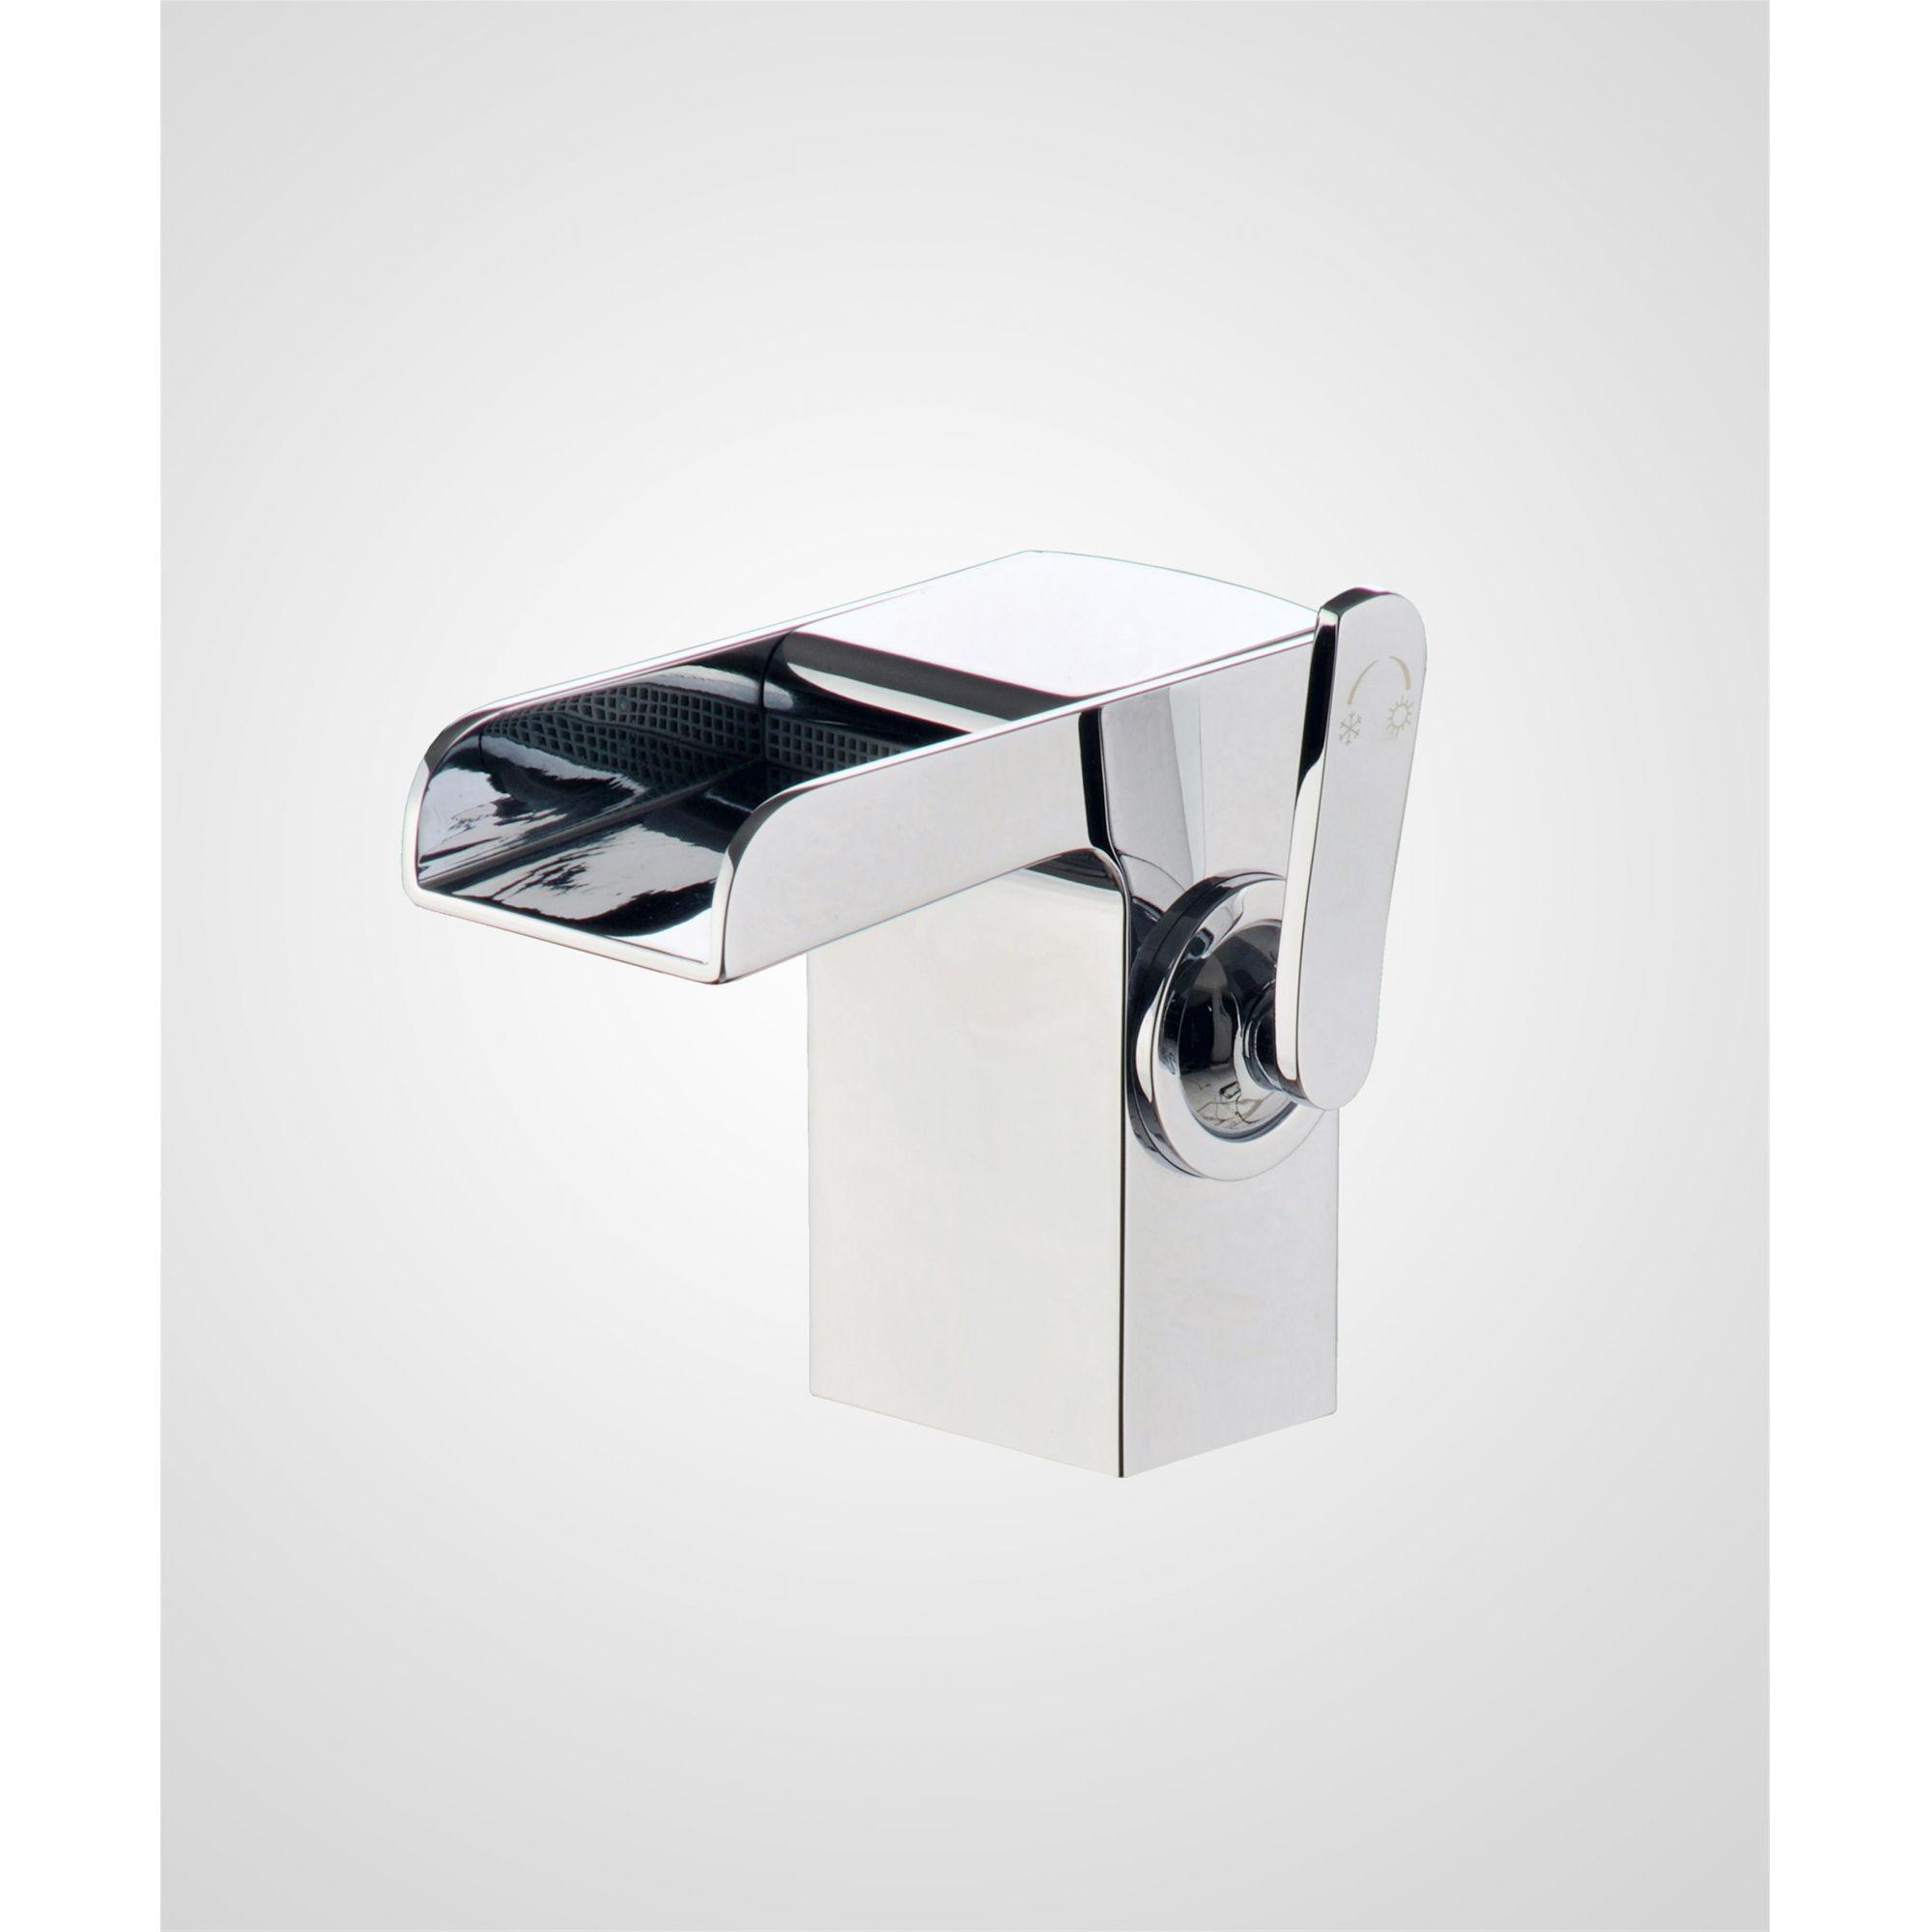 Misturador Monocomando Para Lavatório Ocean C2875 C88  Perflex 10735410